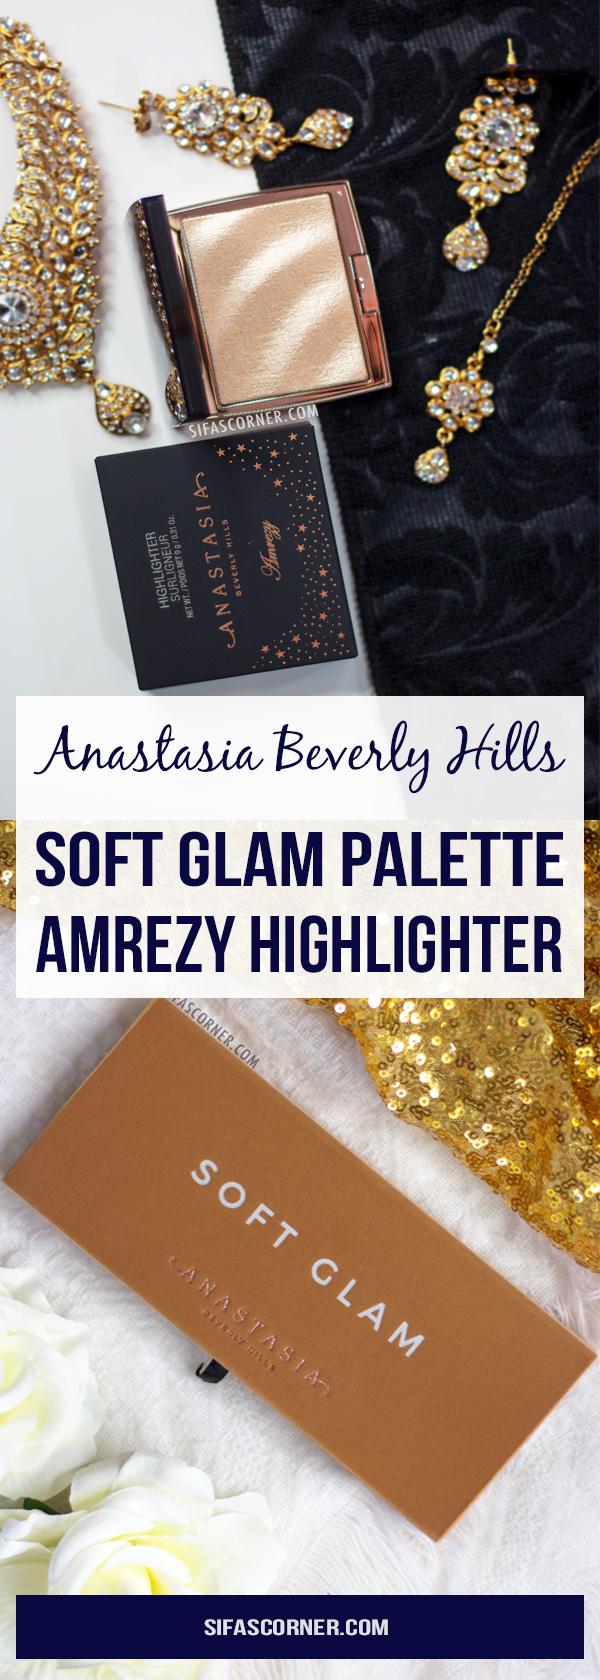 anastasia beverly hills softglam palette